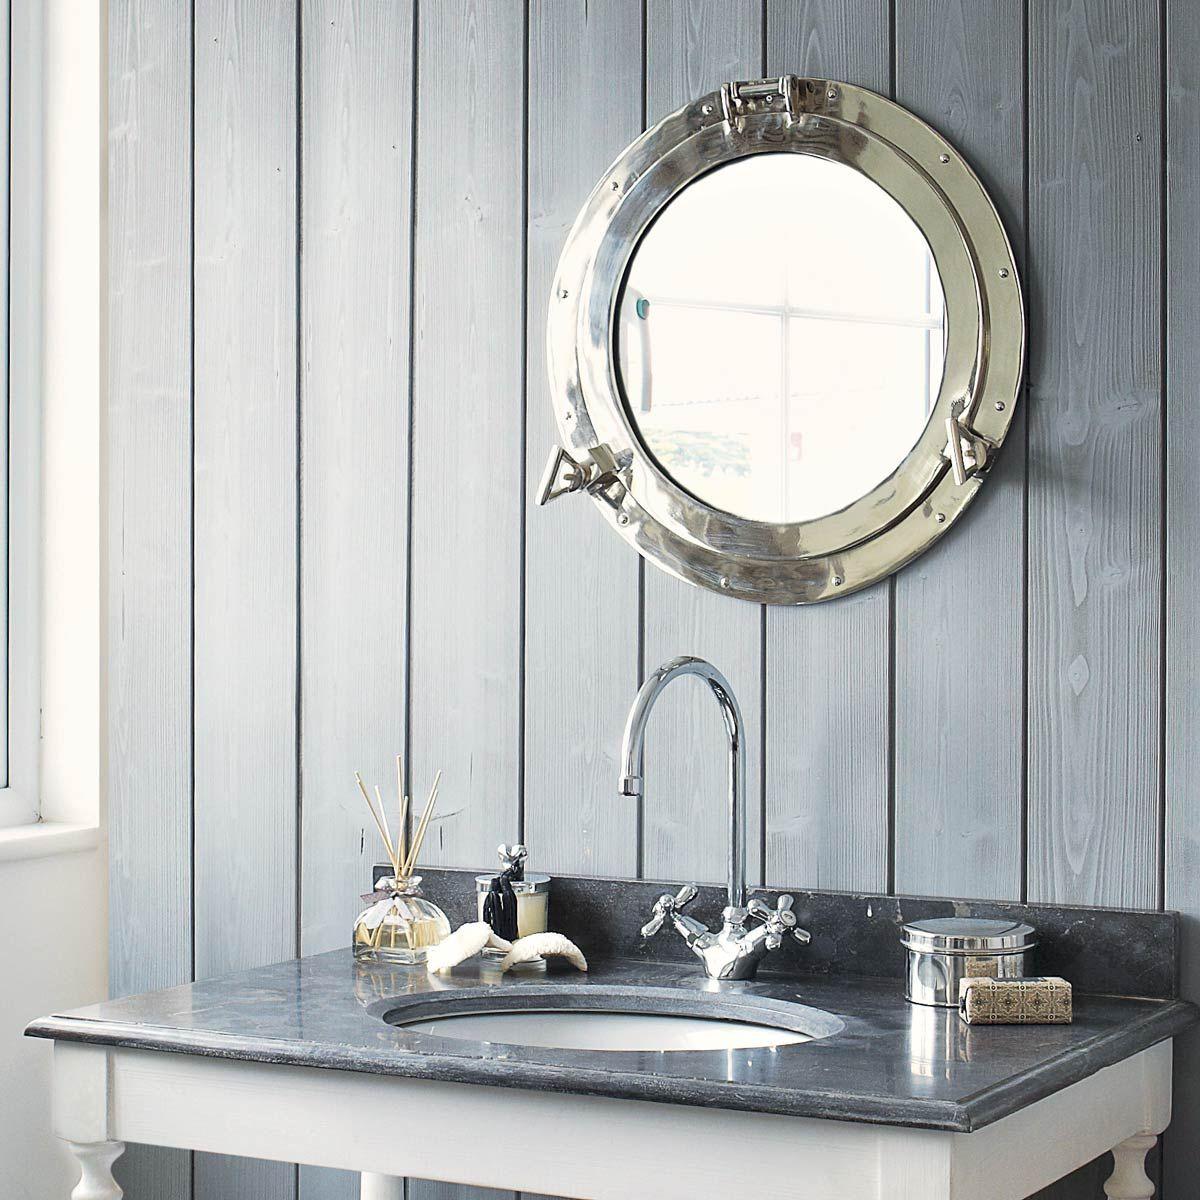 miroir hublot en m tal h 51 cm zee pinterest miroir hublot miroir et miroir salle de bain. Black Bedroom Furniture Sets. Home Design Ideas